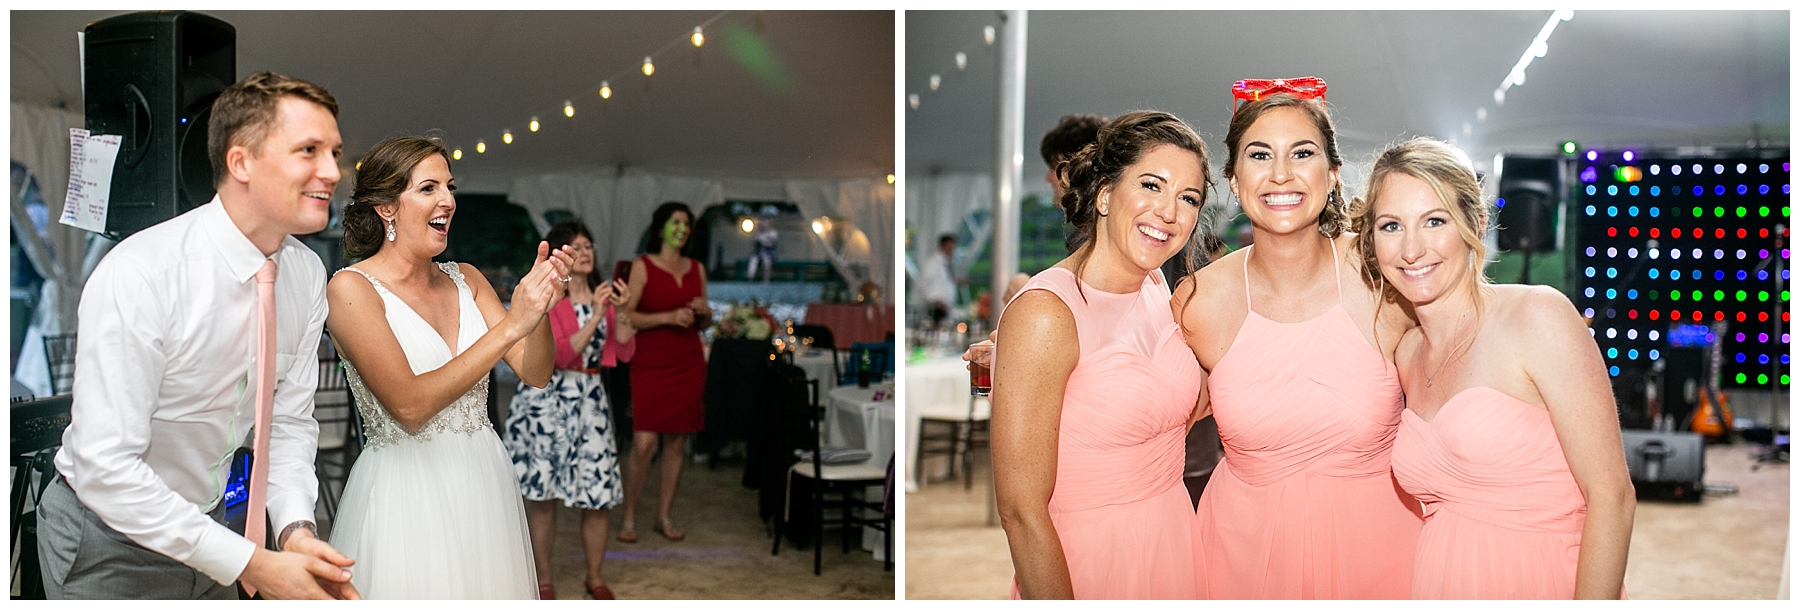 Chelsea Phil Bohemia River Overlook Wedding Living Radiant Photography photos_0200.jpg